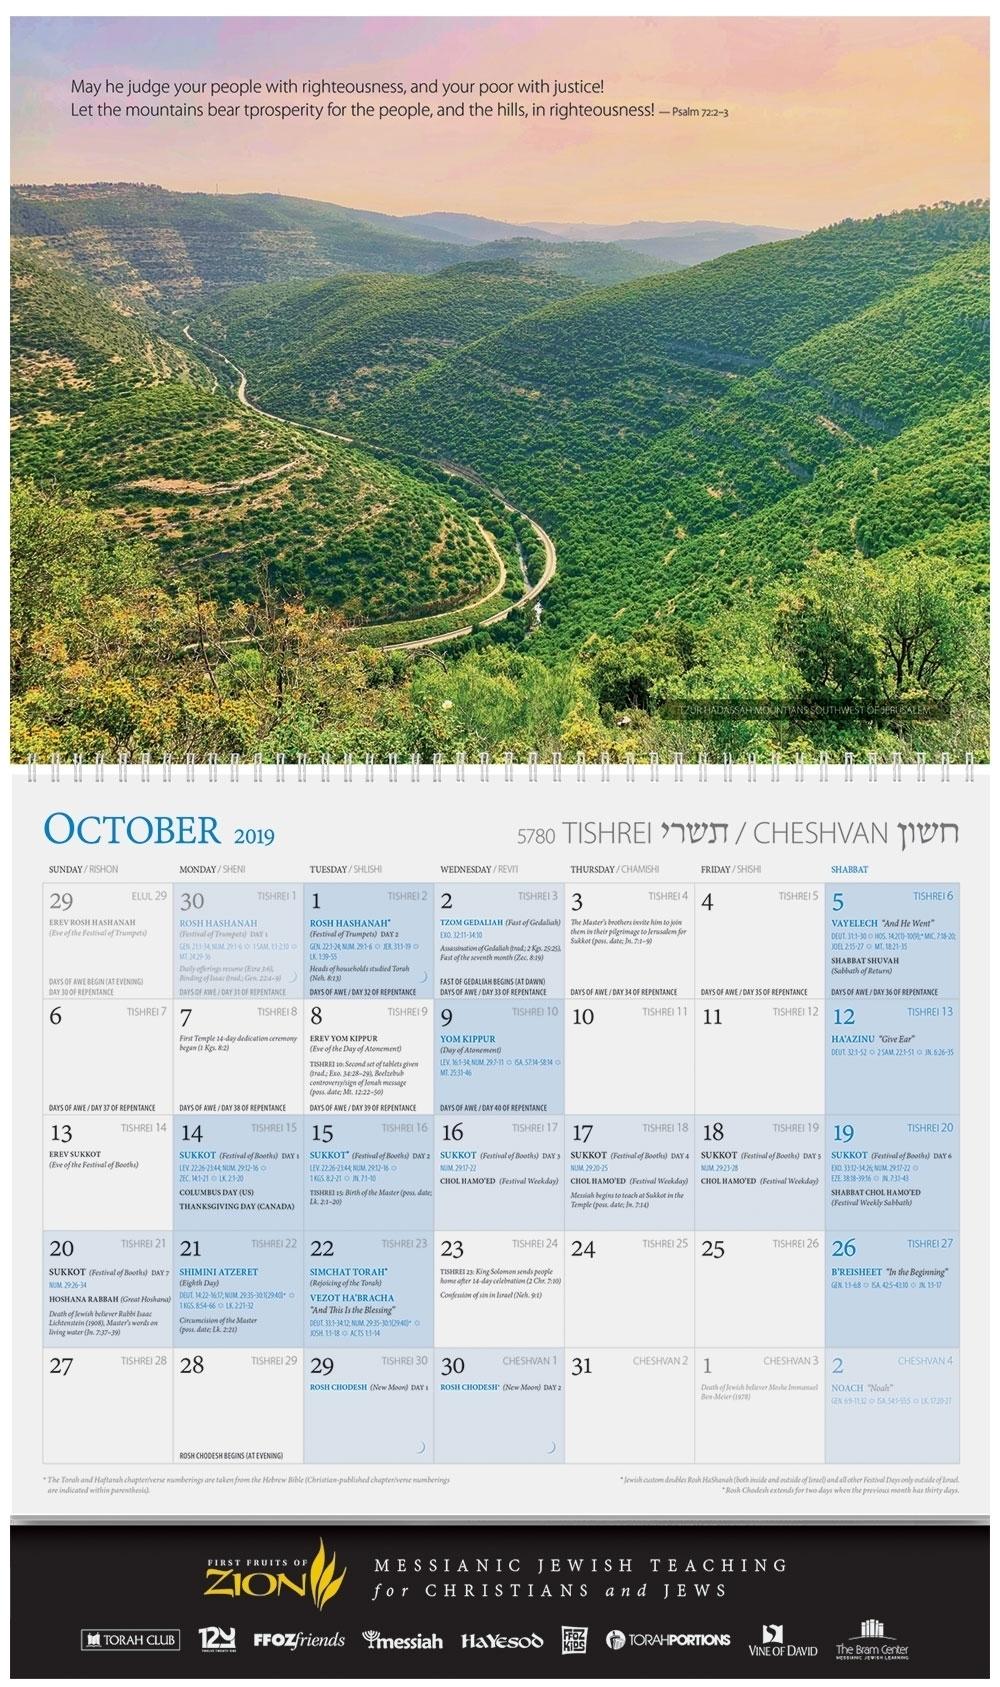 Weekly Torah Parsha Calendar For 2019/2020 - Calendar within 2019 Calendar Of Torah Portions